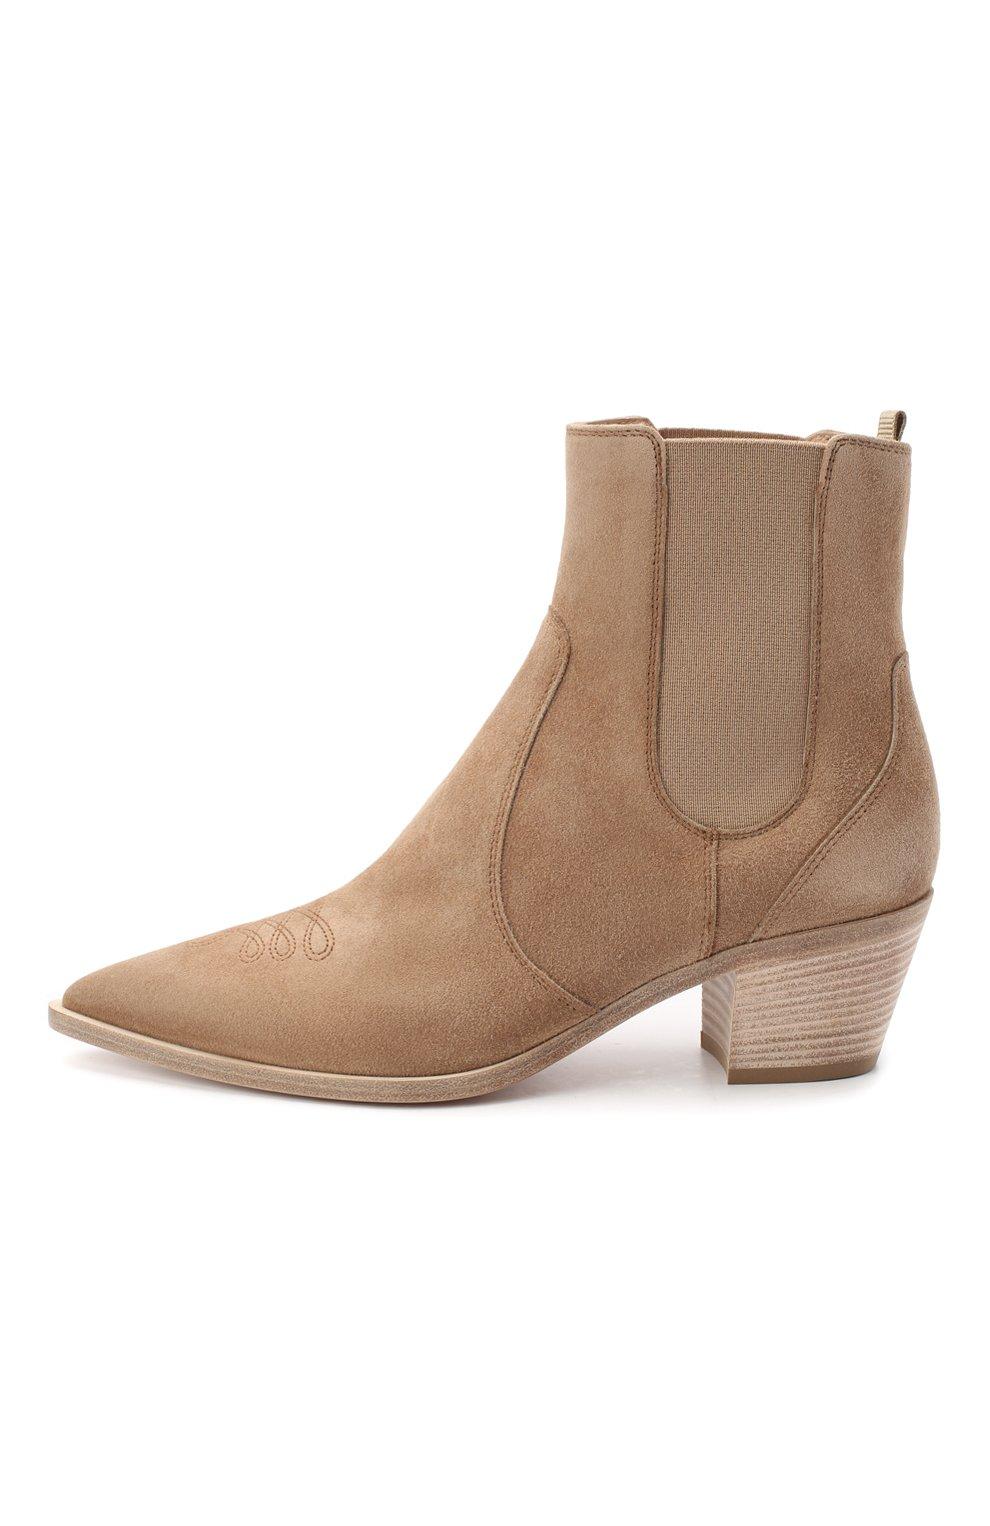 Женские кожаные ботинки romney 45 GIANVITO ROSSI бежевого цвета, арт. G70343.45CU0.CASBISQ | Фото 3